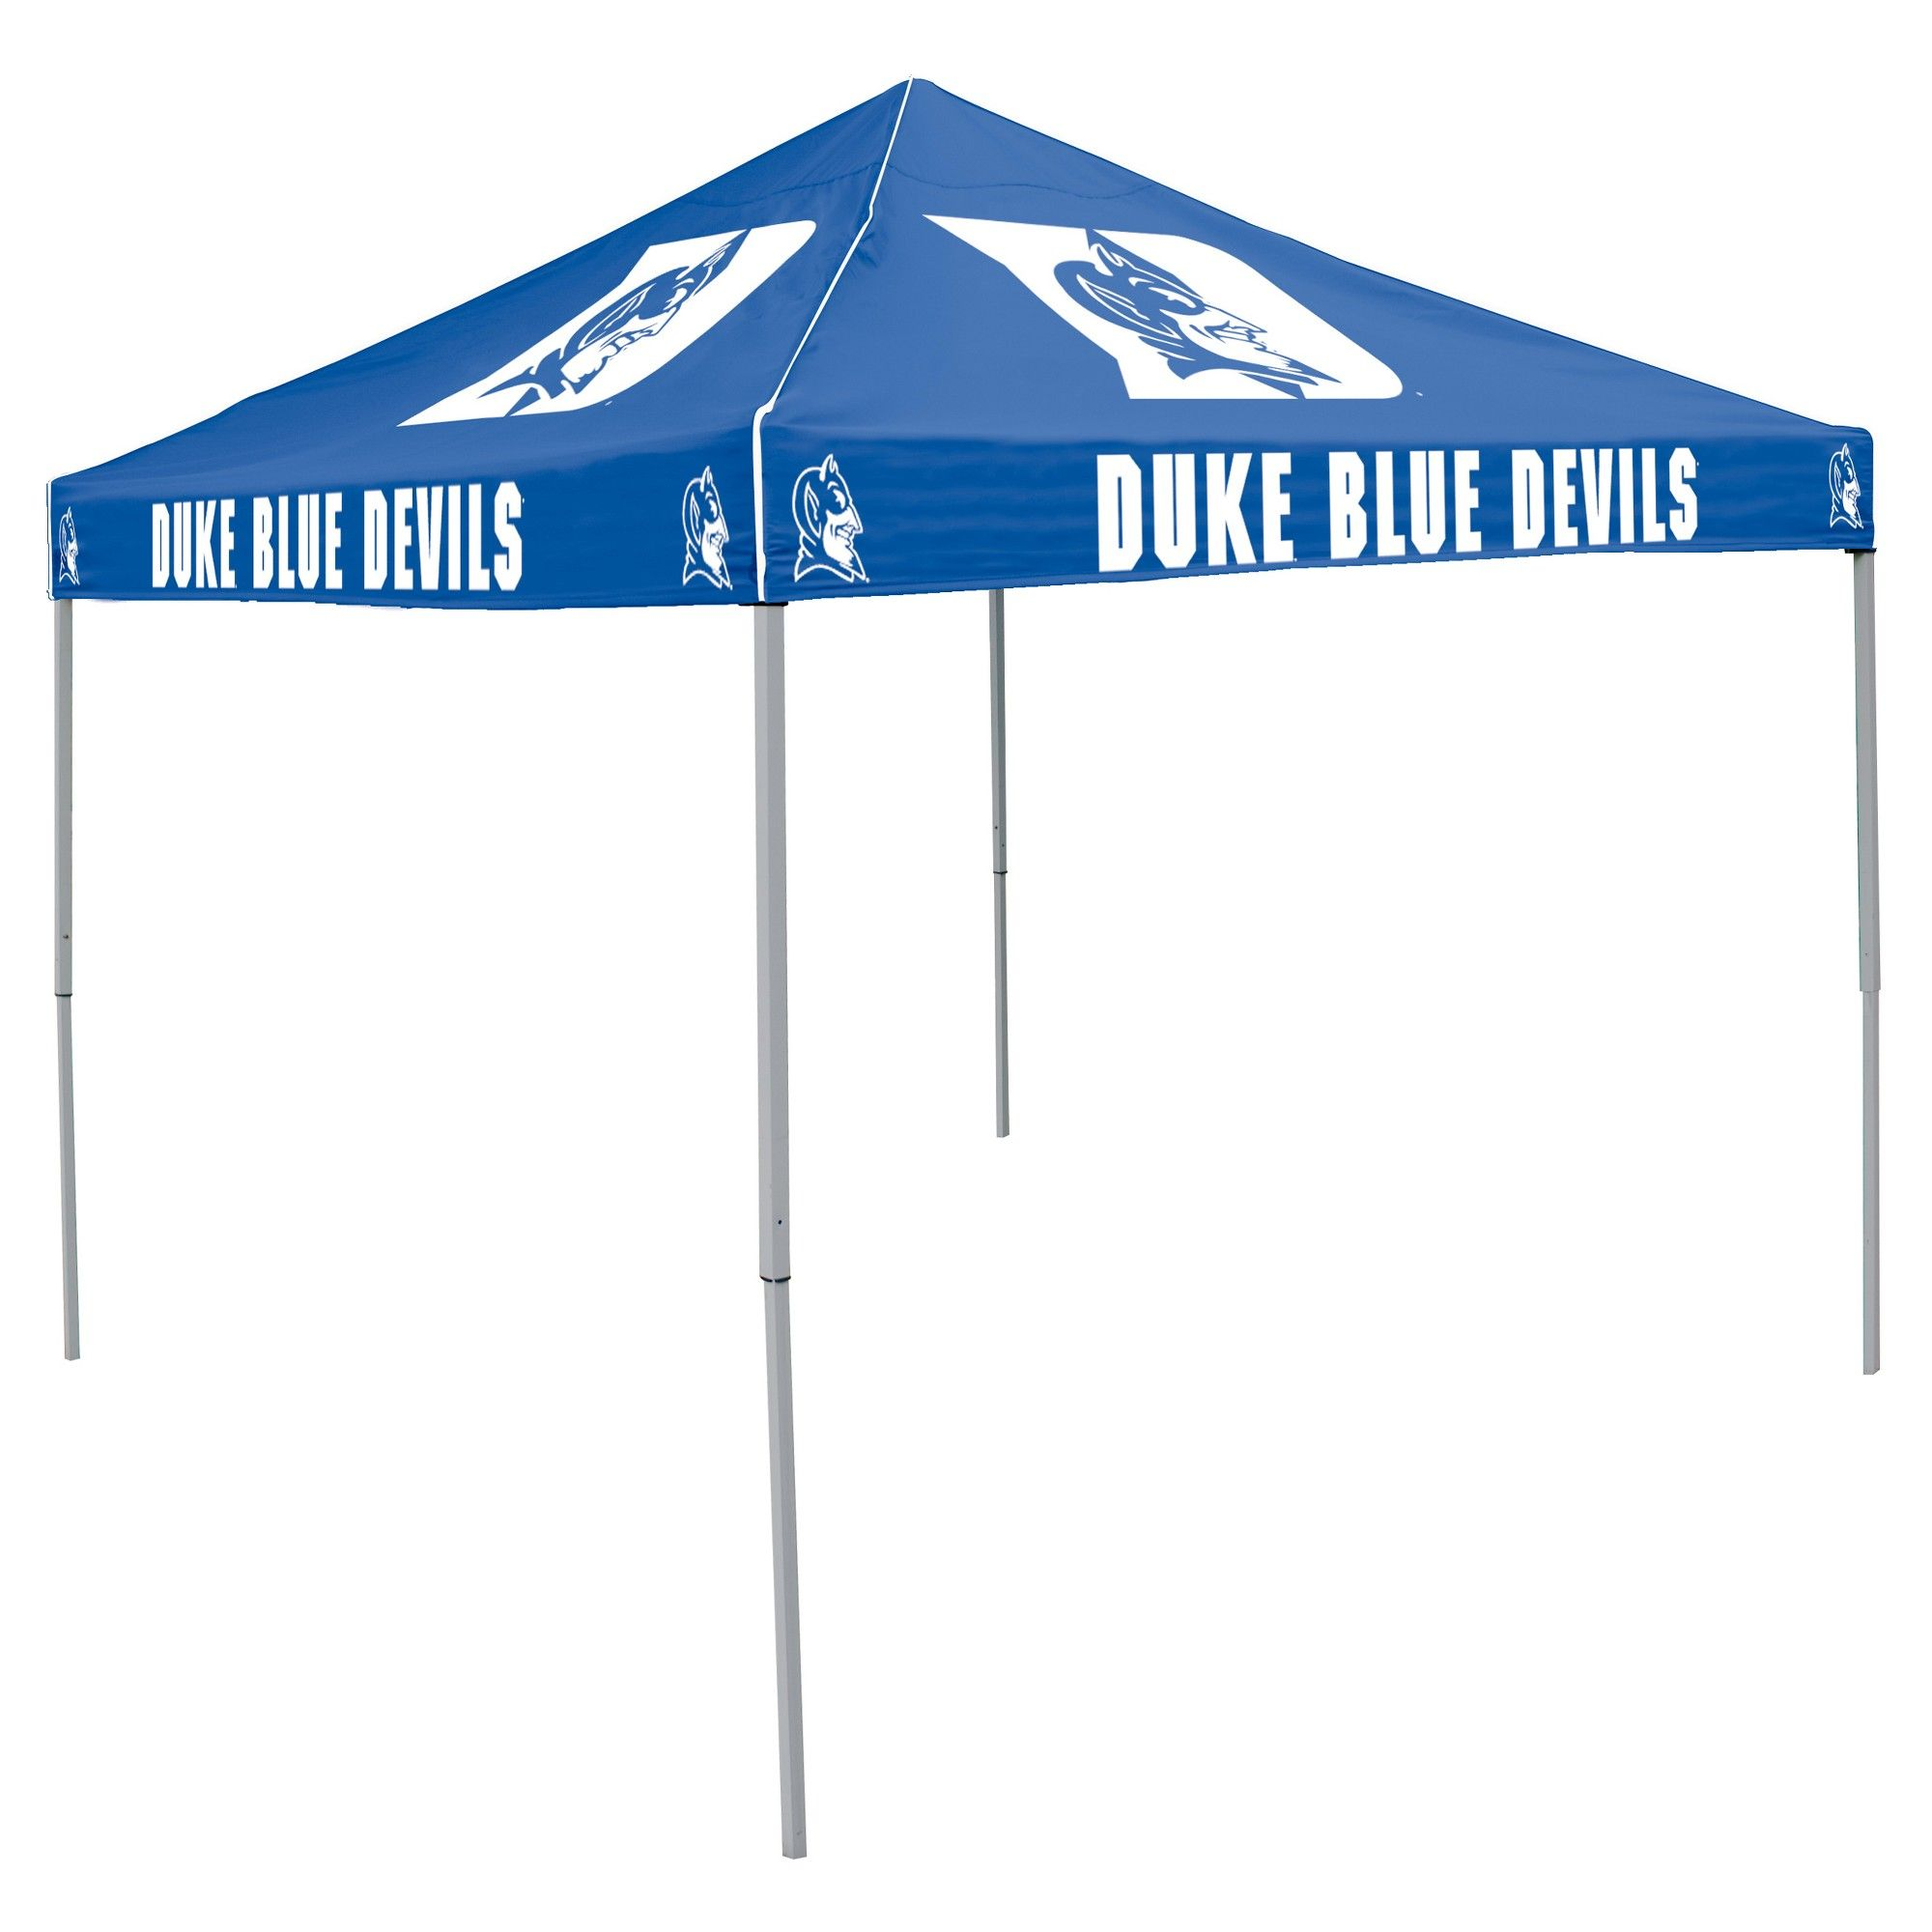 NCAA Duke Blue Devils Logo Brands 9x9 Canopy Tent  sc 1 st  Pinterest & NCAA Duke Blue Devils Logo Brands 9x9 Canopy Tent | Canopy tent ...